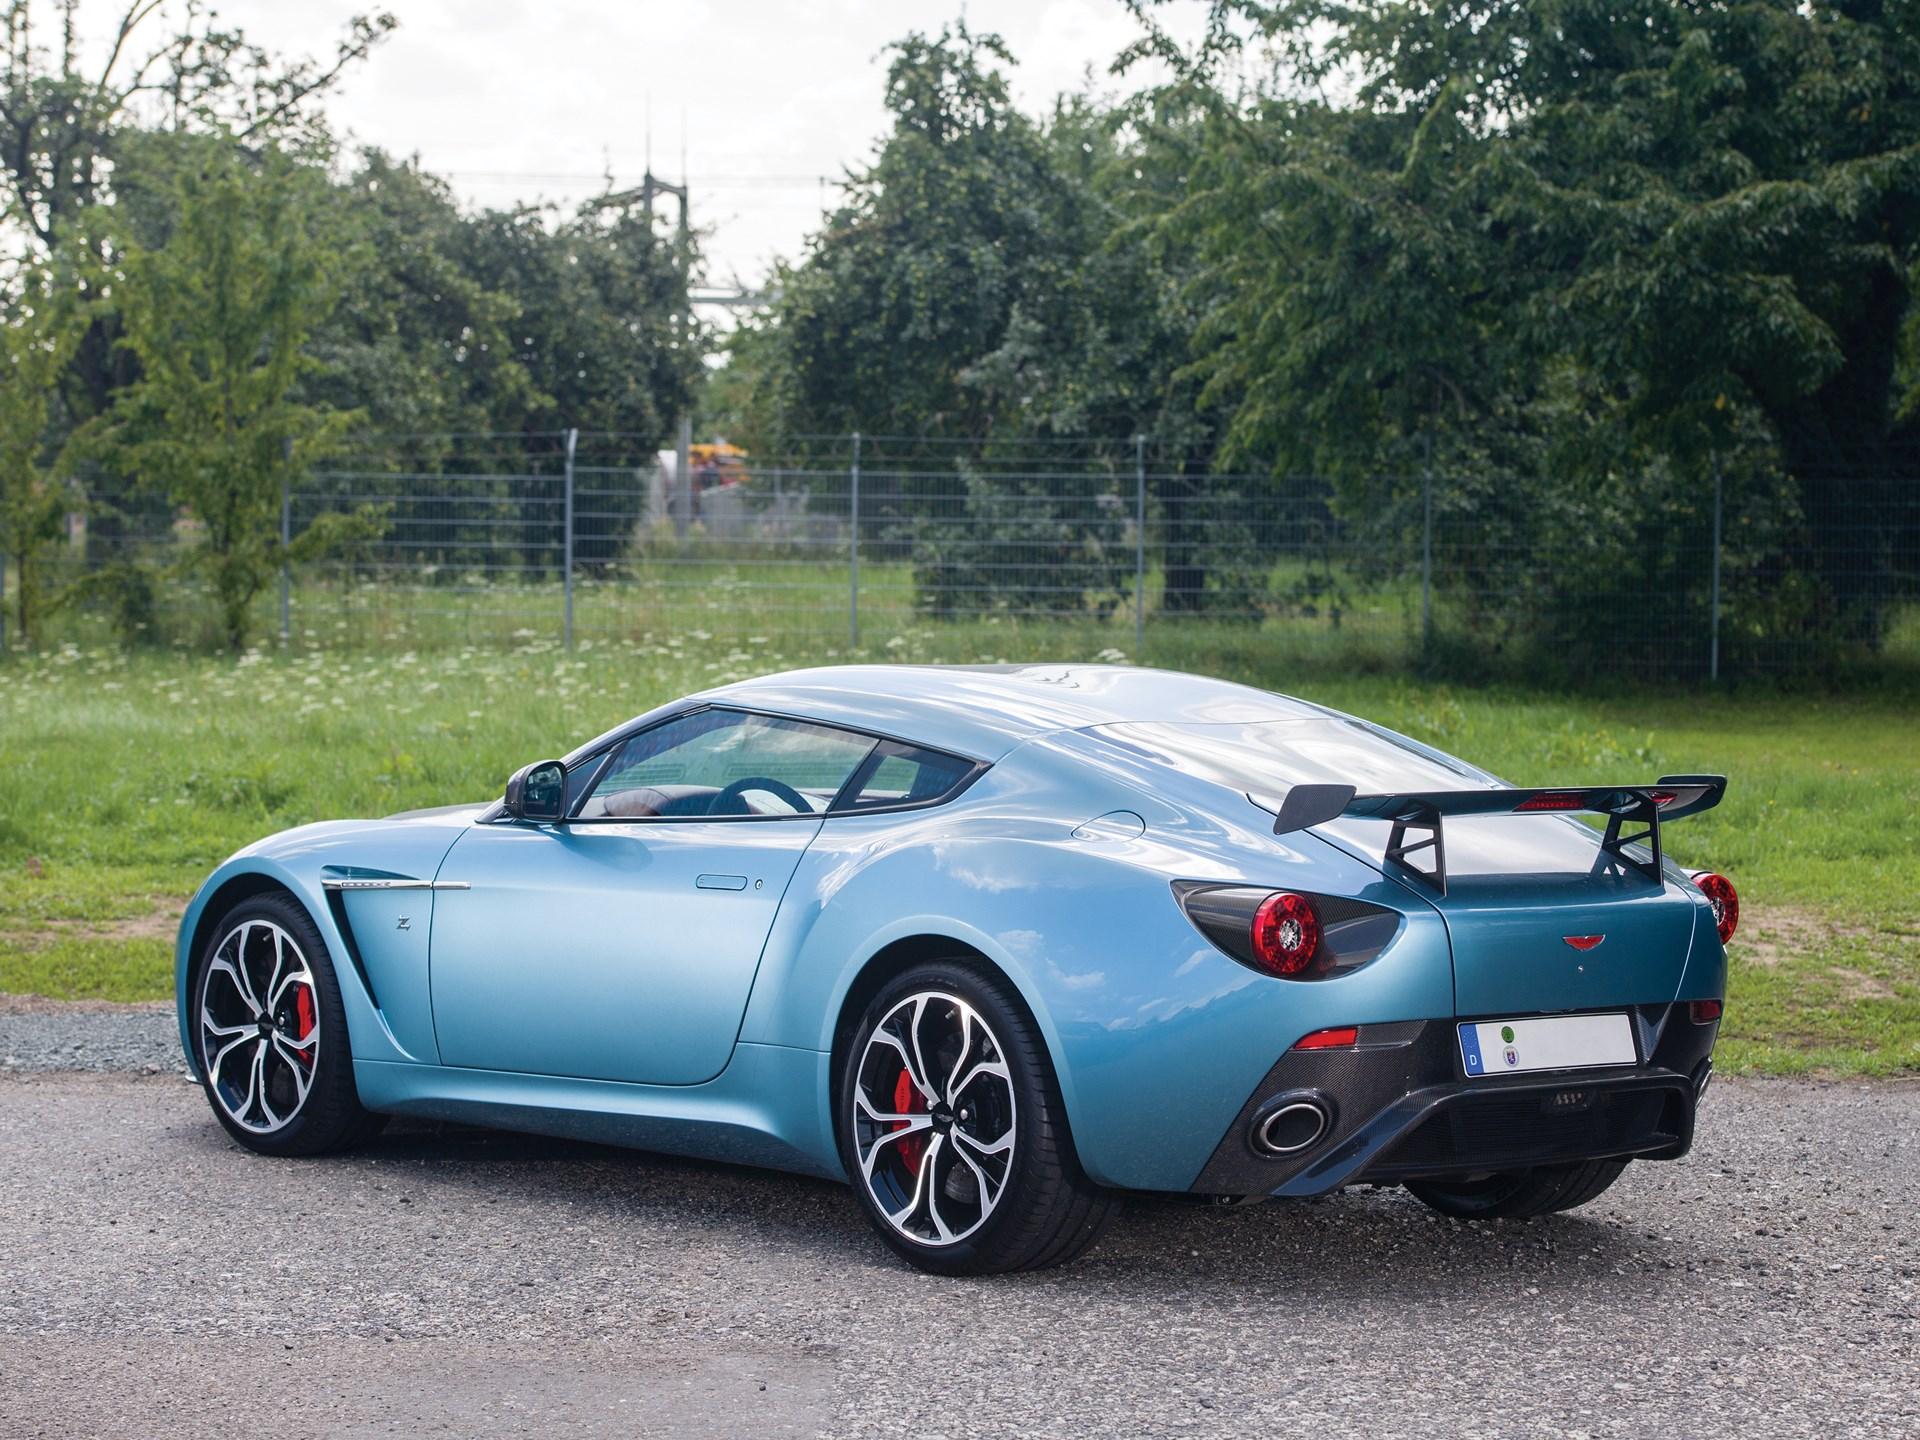 RM Sothebys Aston Martin V Zagato London - Aston martin v12 zagato